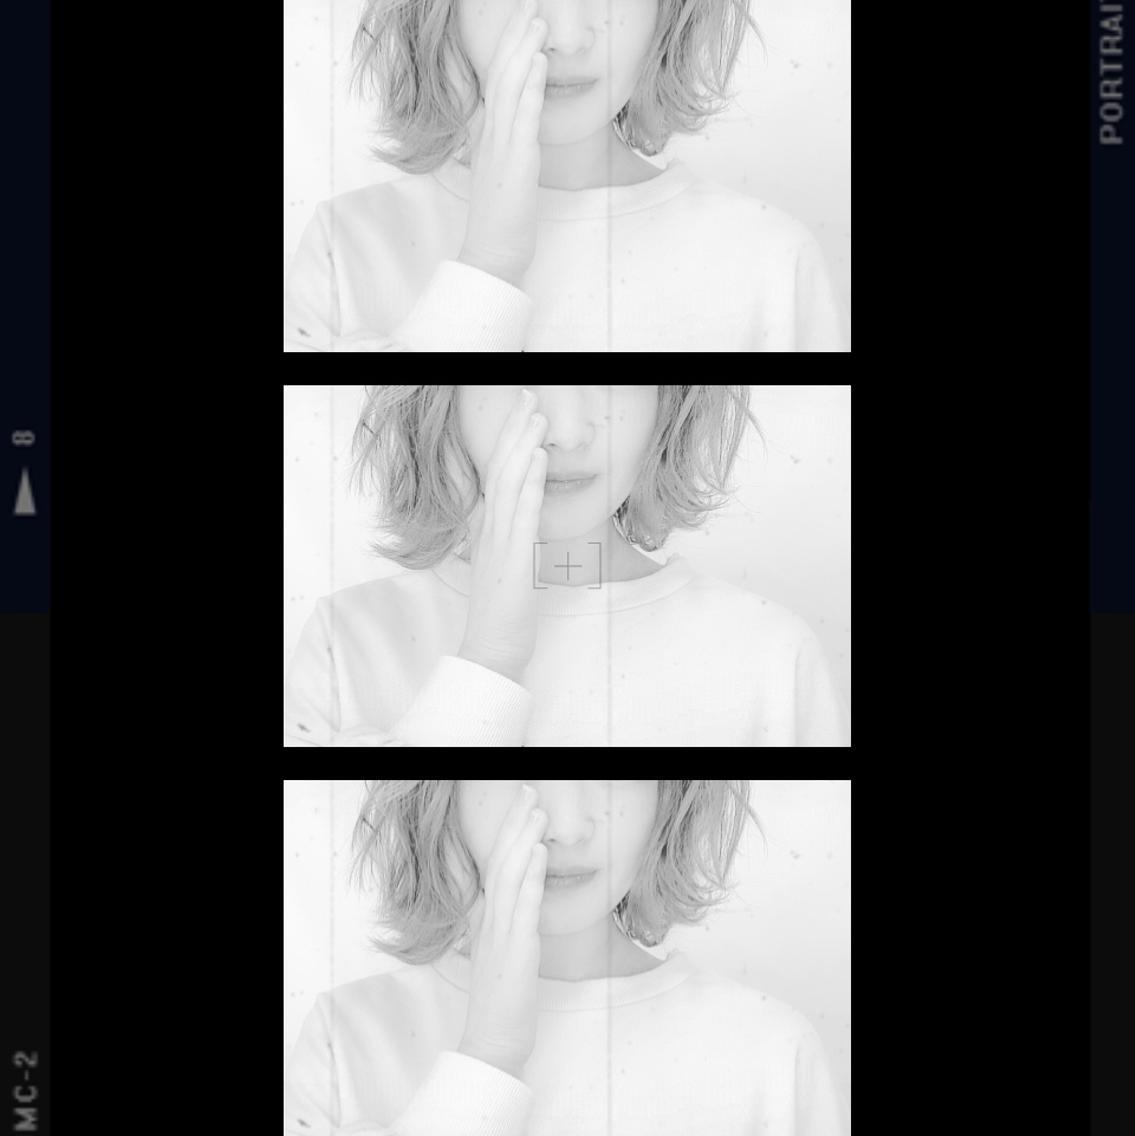 BIZE梅田本店【ビゼ】所属・stylist masatoの掲載